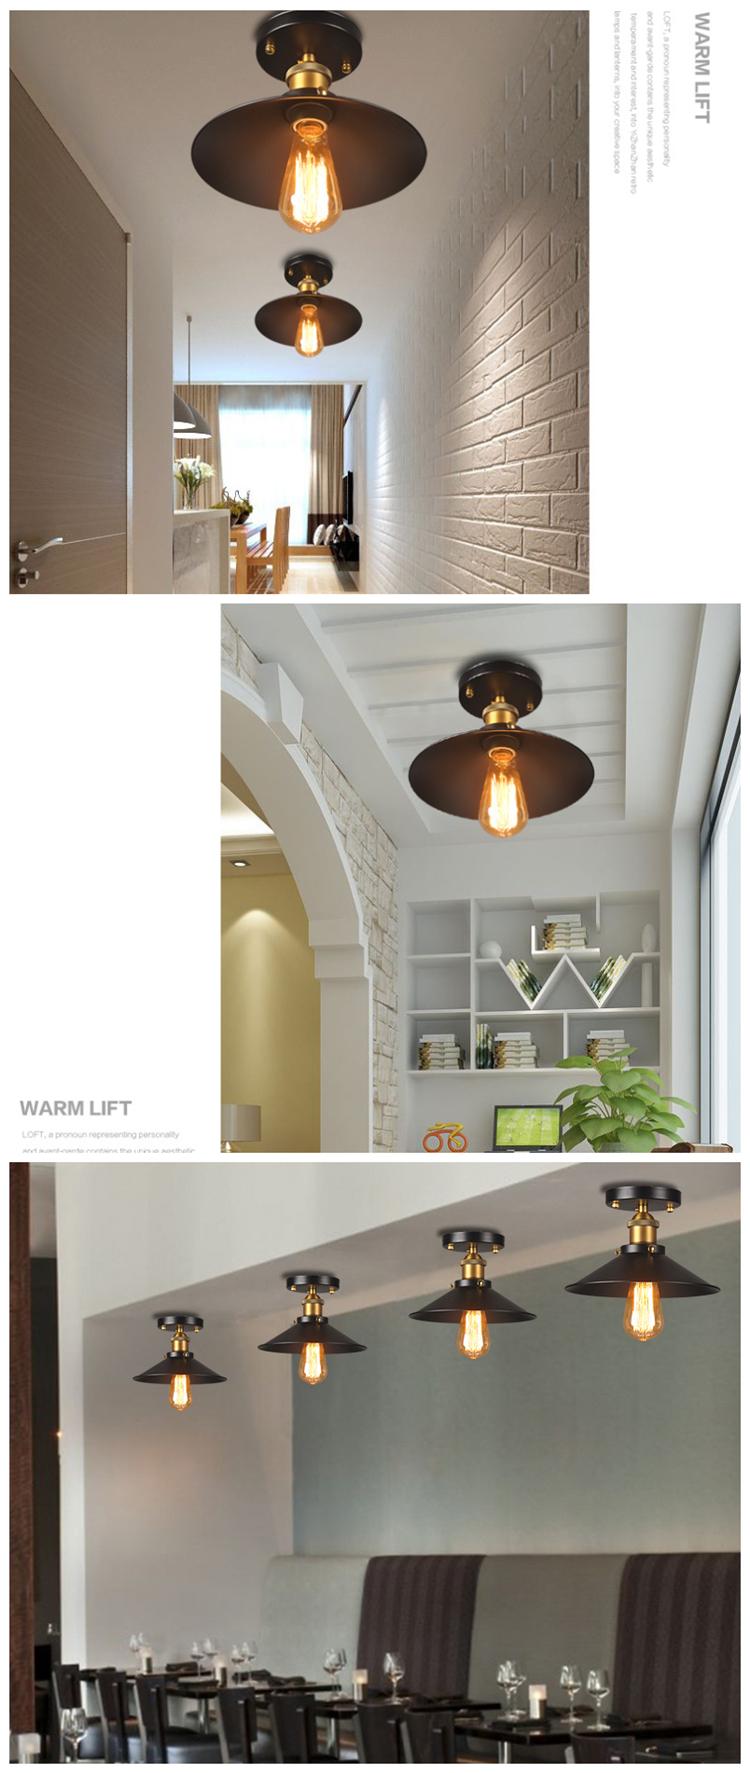 Loft Balcony Lamps Black Vintage Industrial Iron Ceiling Light